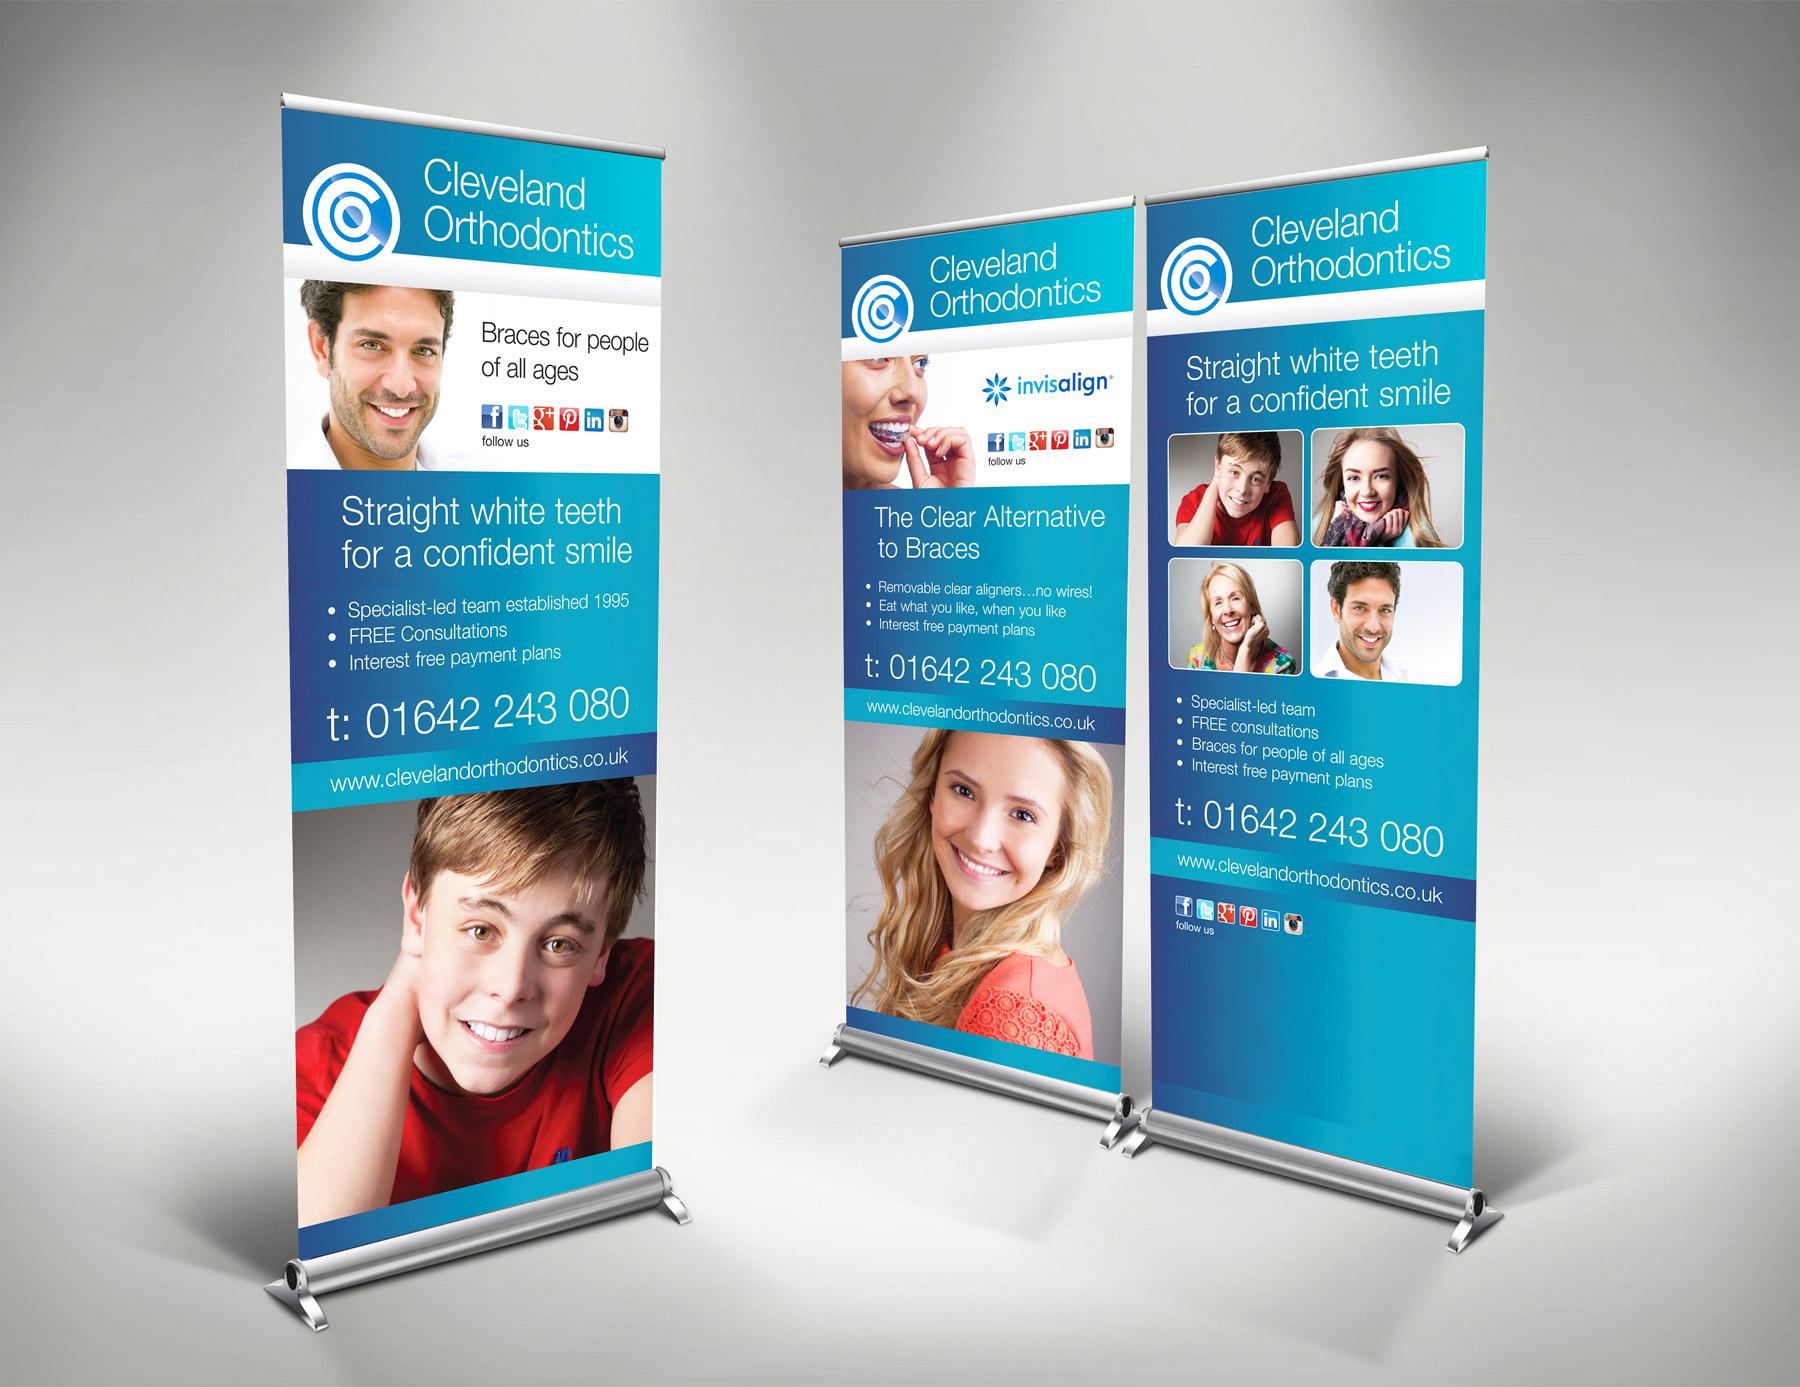 Cleveland Creative Design: Cleveland Orthodontics